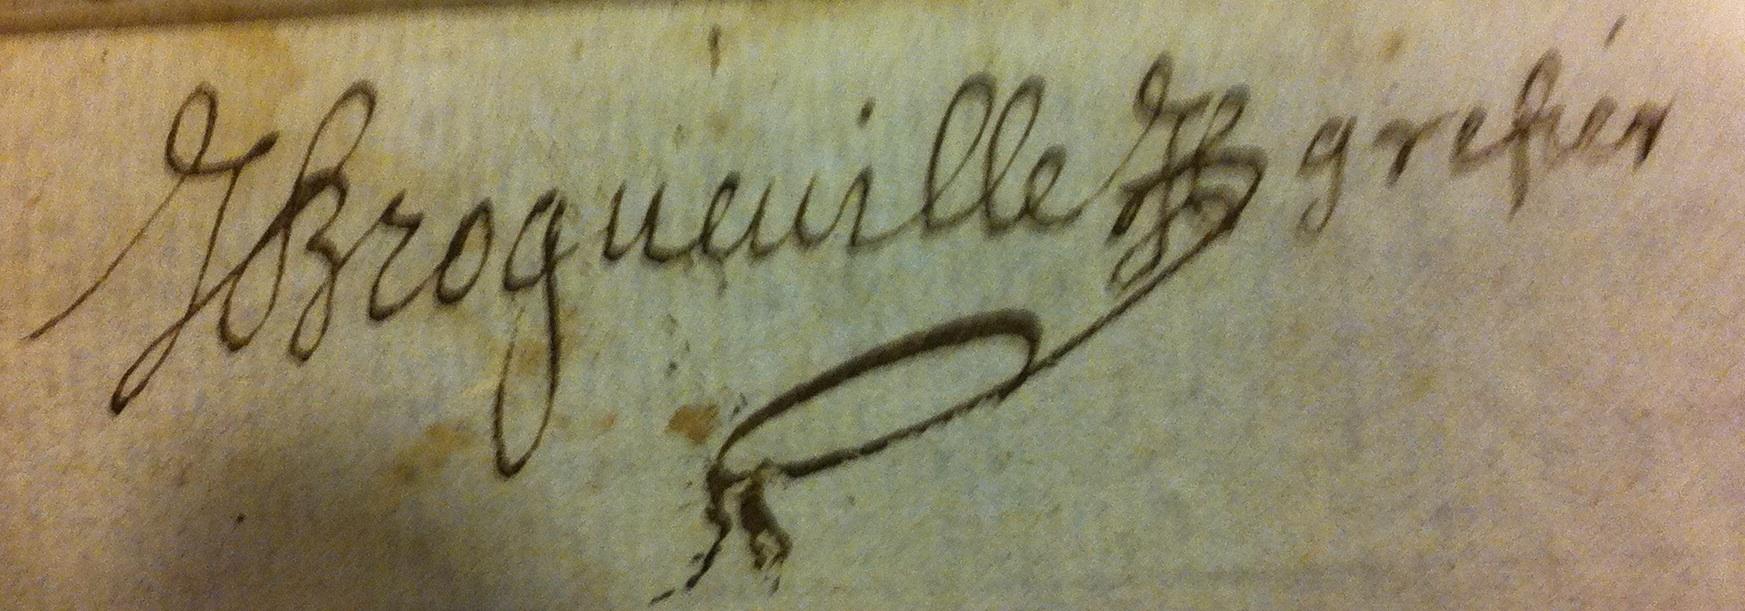 9558-jean-greffier-signature